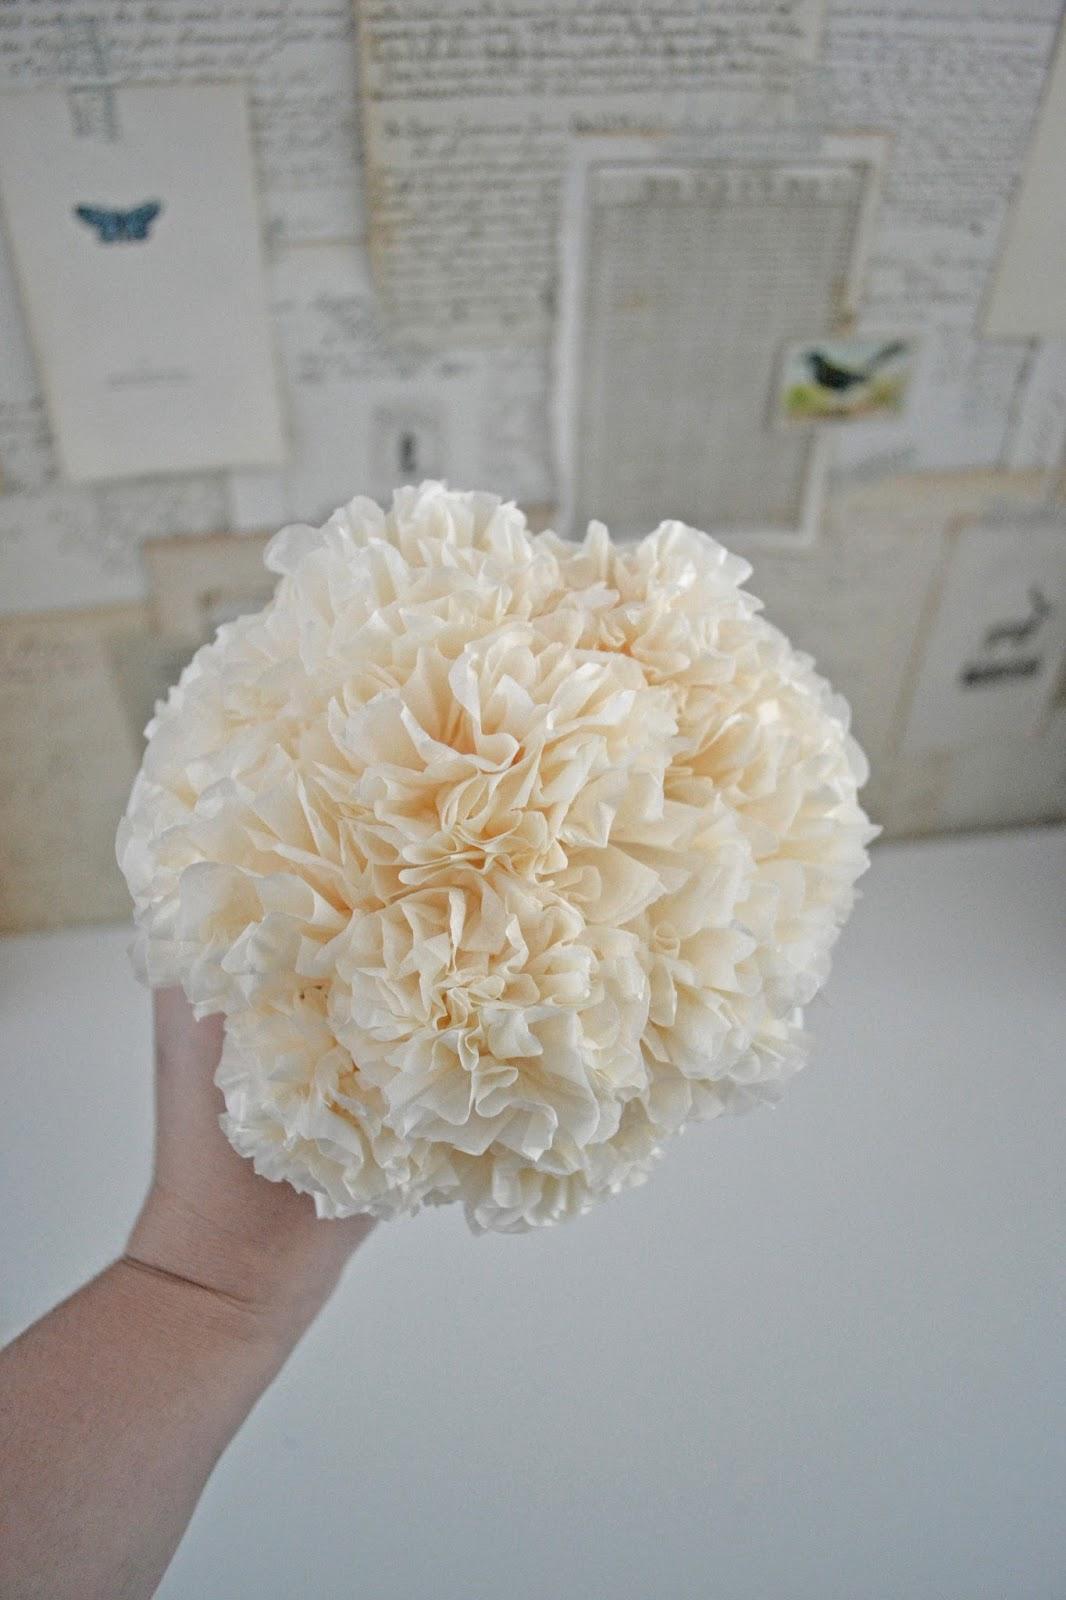 Liz Mathews Tissue Paper Flower Video Tutorial